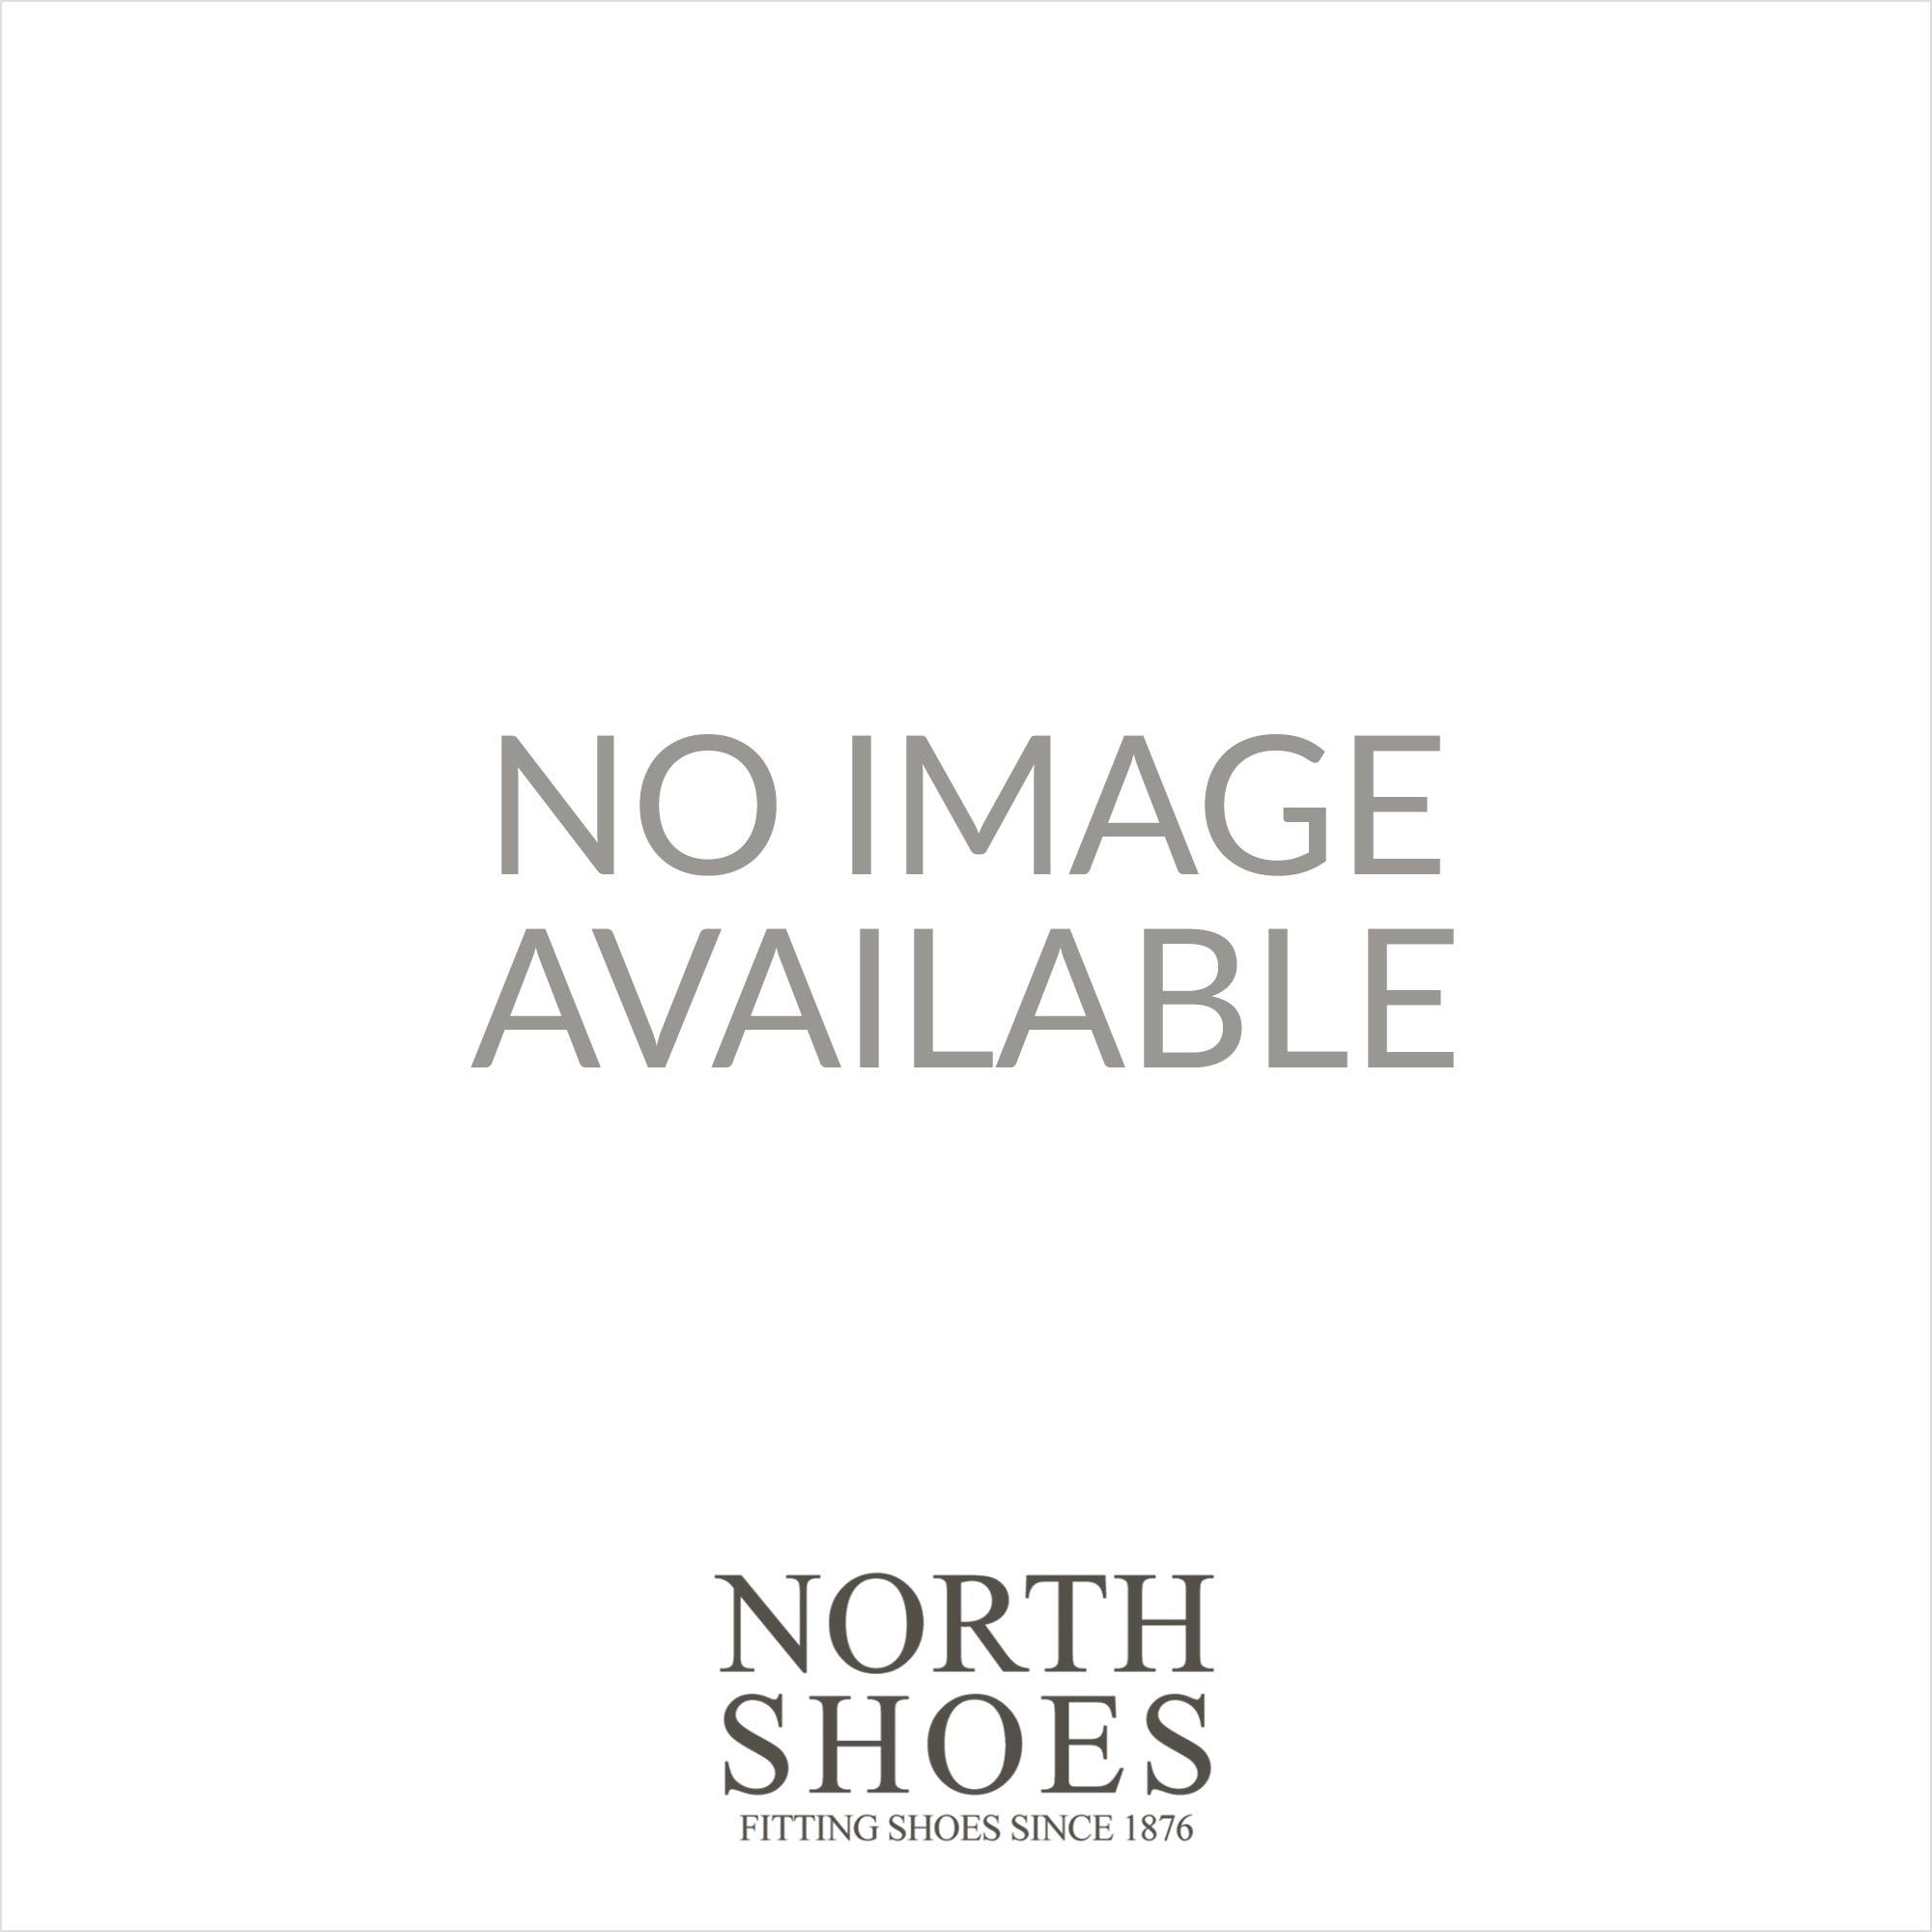 2038426434 Vans VA349SMIT Navy Canvas Unisex Lace Up Casual Shoe - UK 2 - Vans from  North Shoes UK